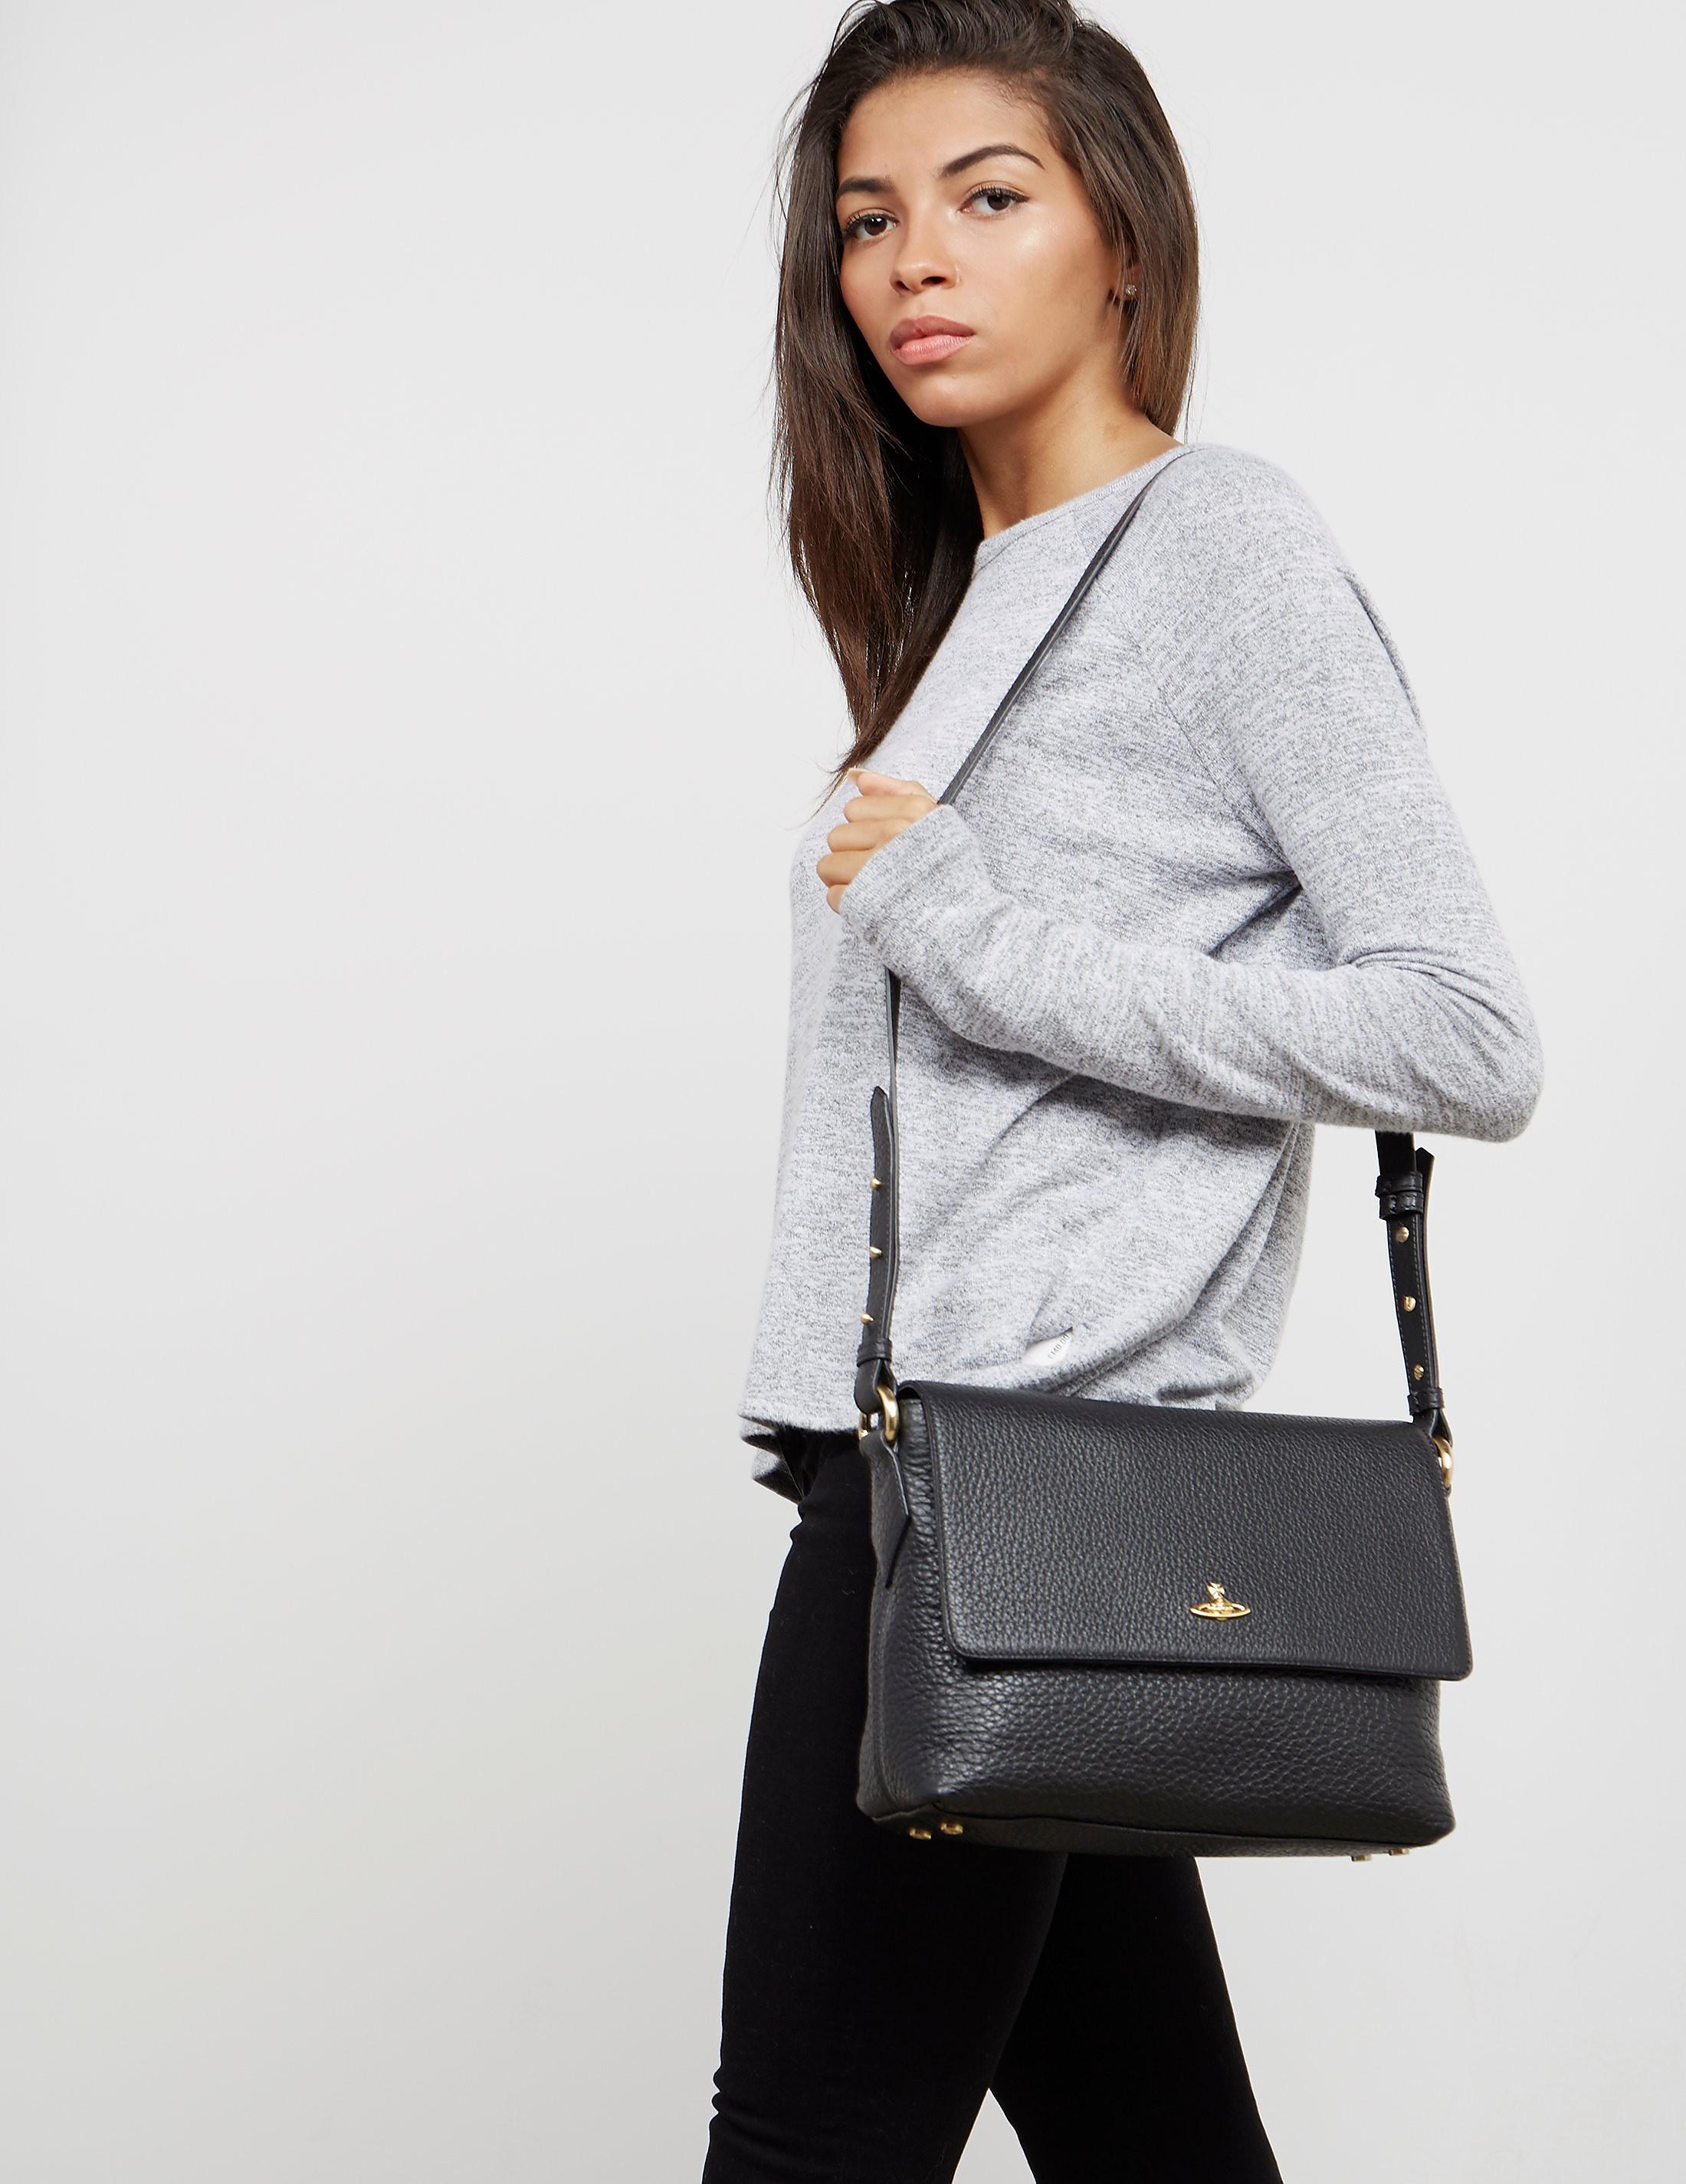 Vivienne Westwood Belgravia Crossbody Bag - Online Exclusive